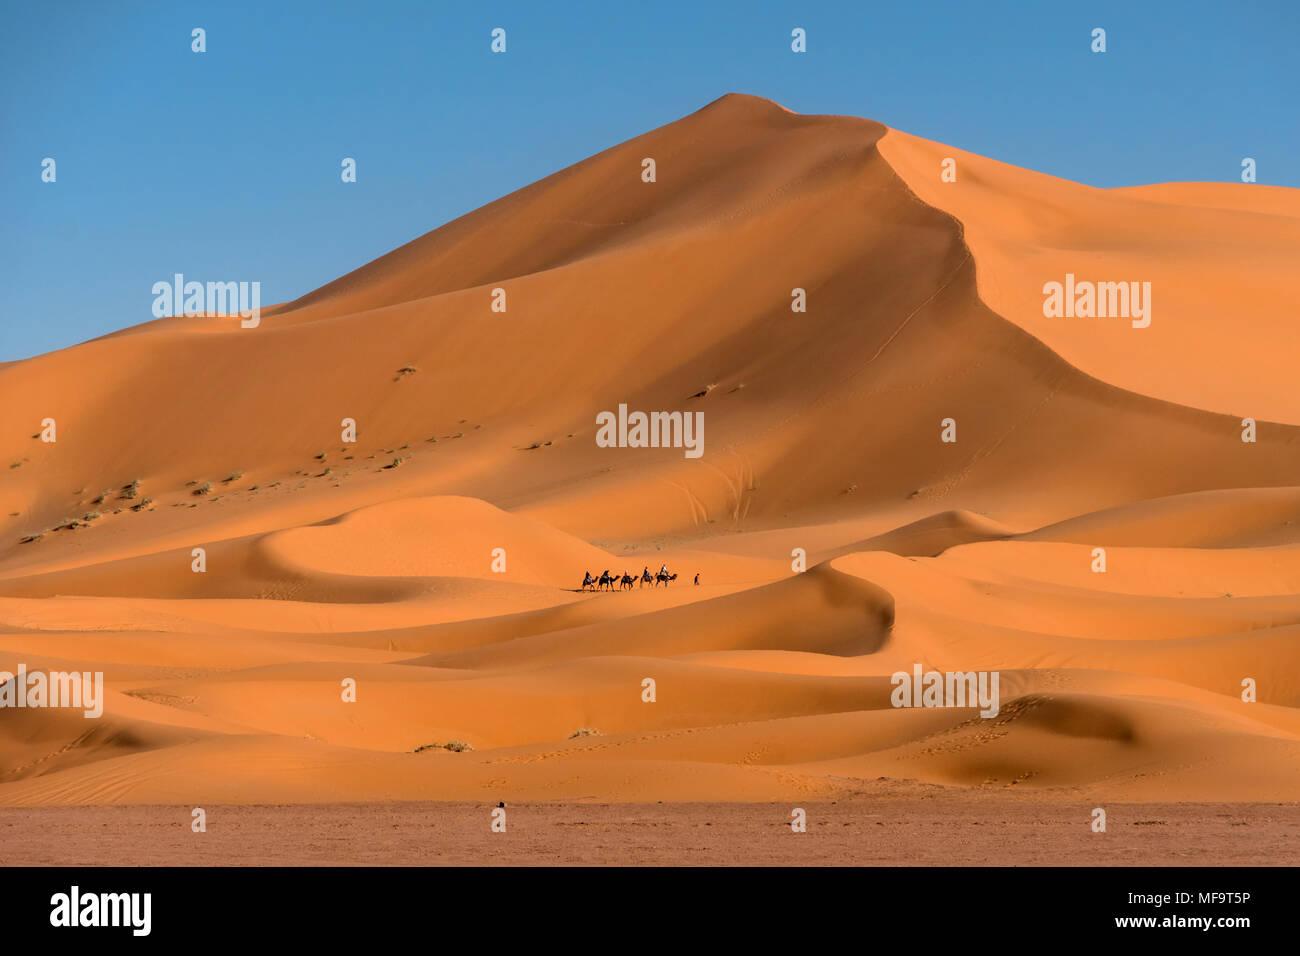 Camel Train, Erg Chebbi Desert, Western Sahara, Morocco - Stock Image